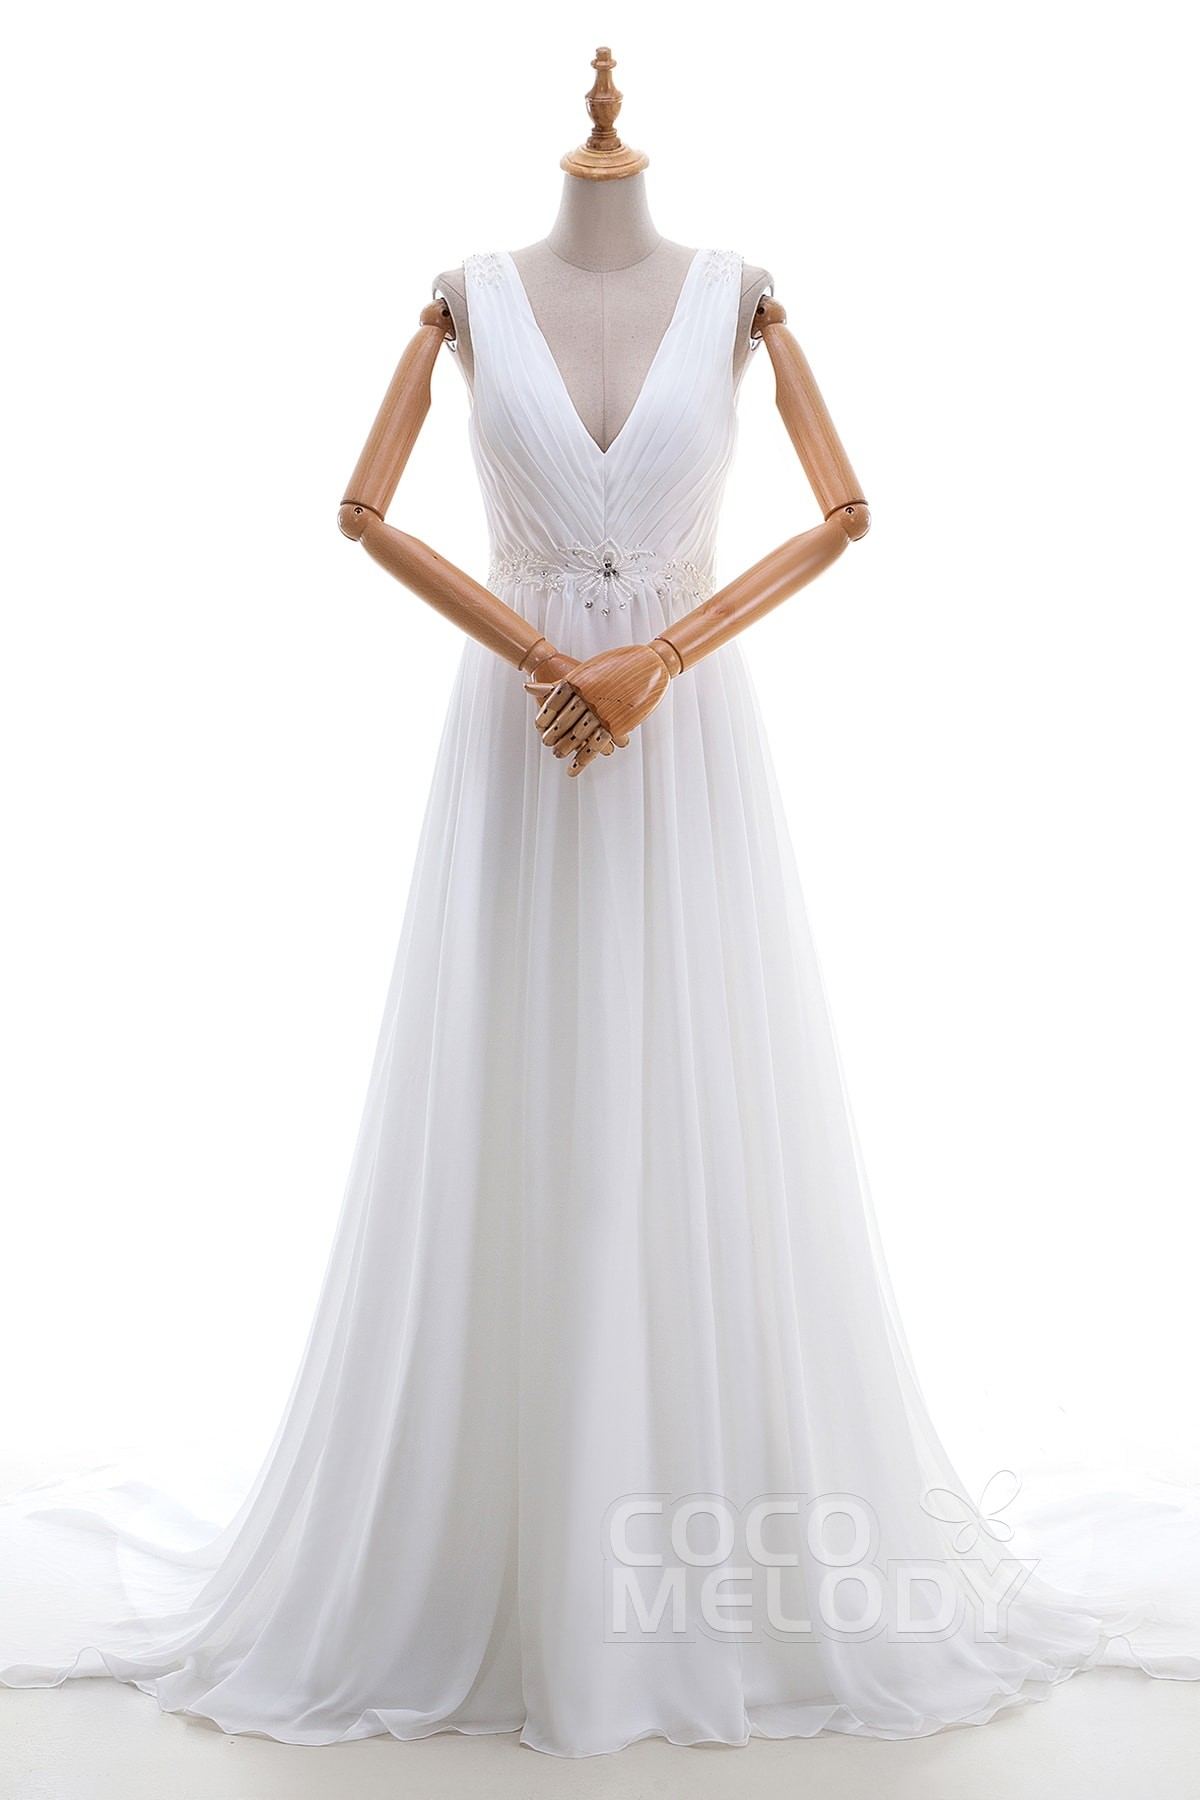 Sheath Long Scoop Sleeveless Lace-Up Chiffon Dress With Lace And Beading